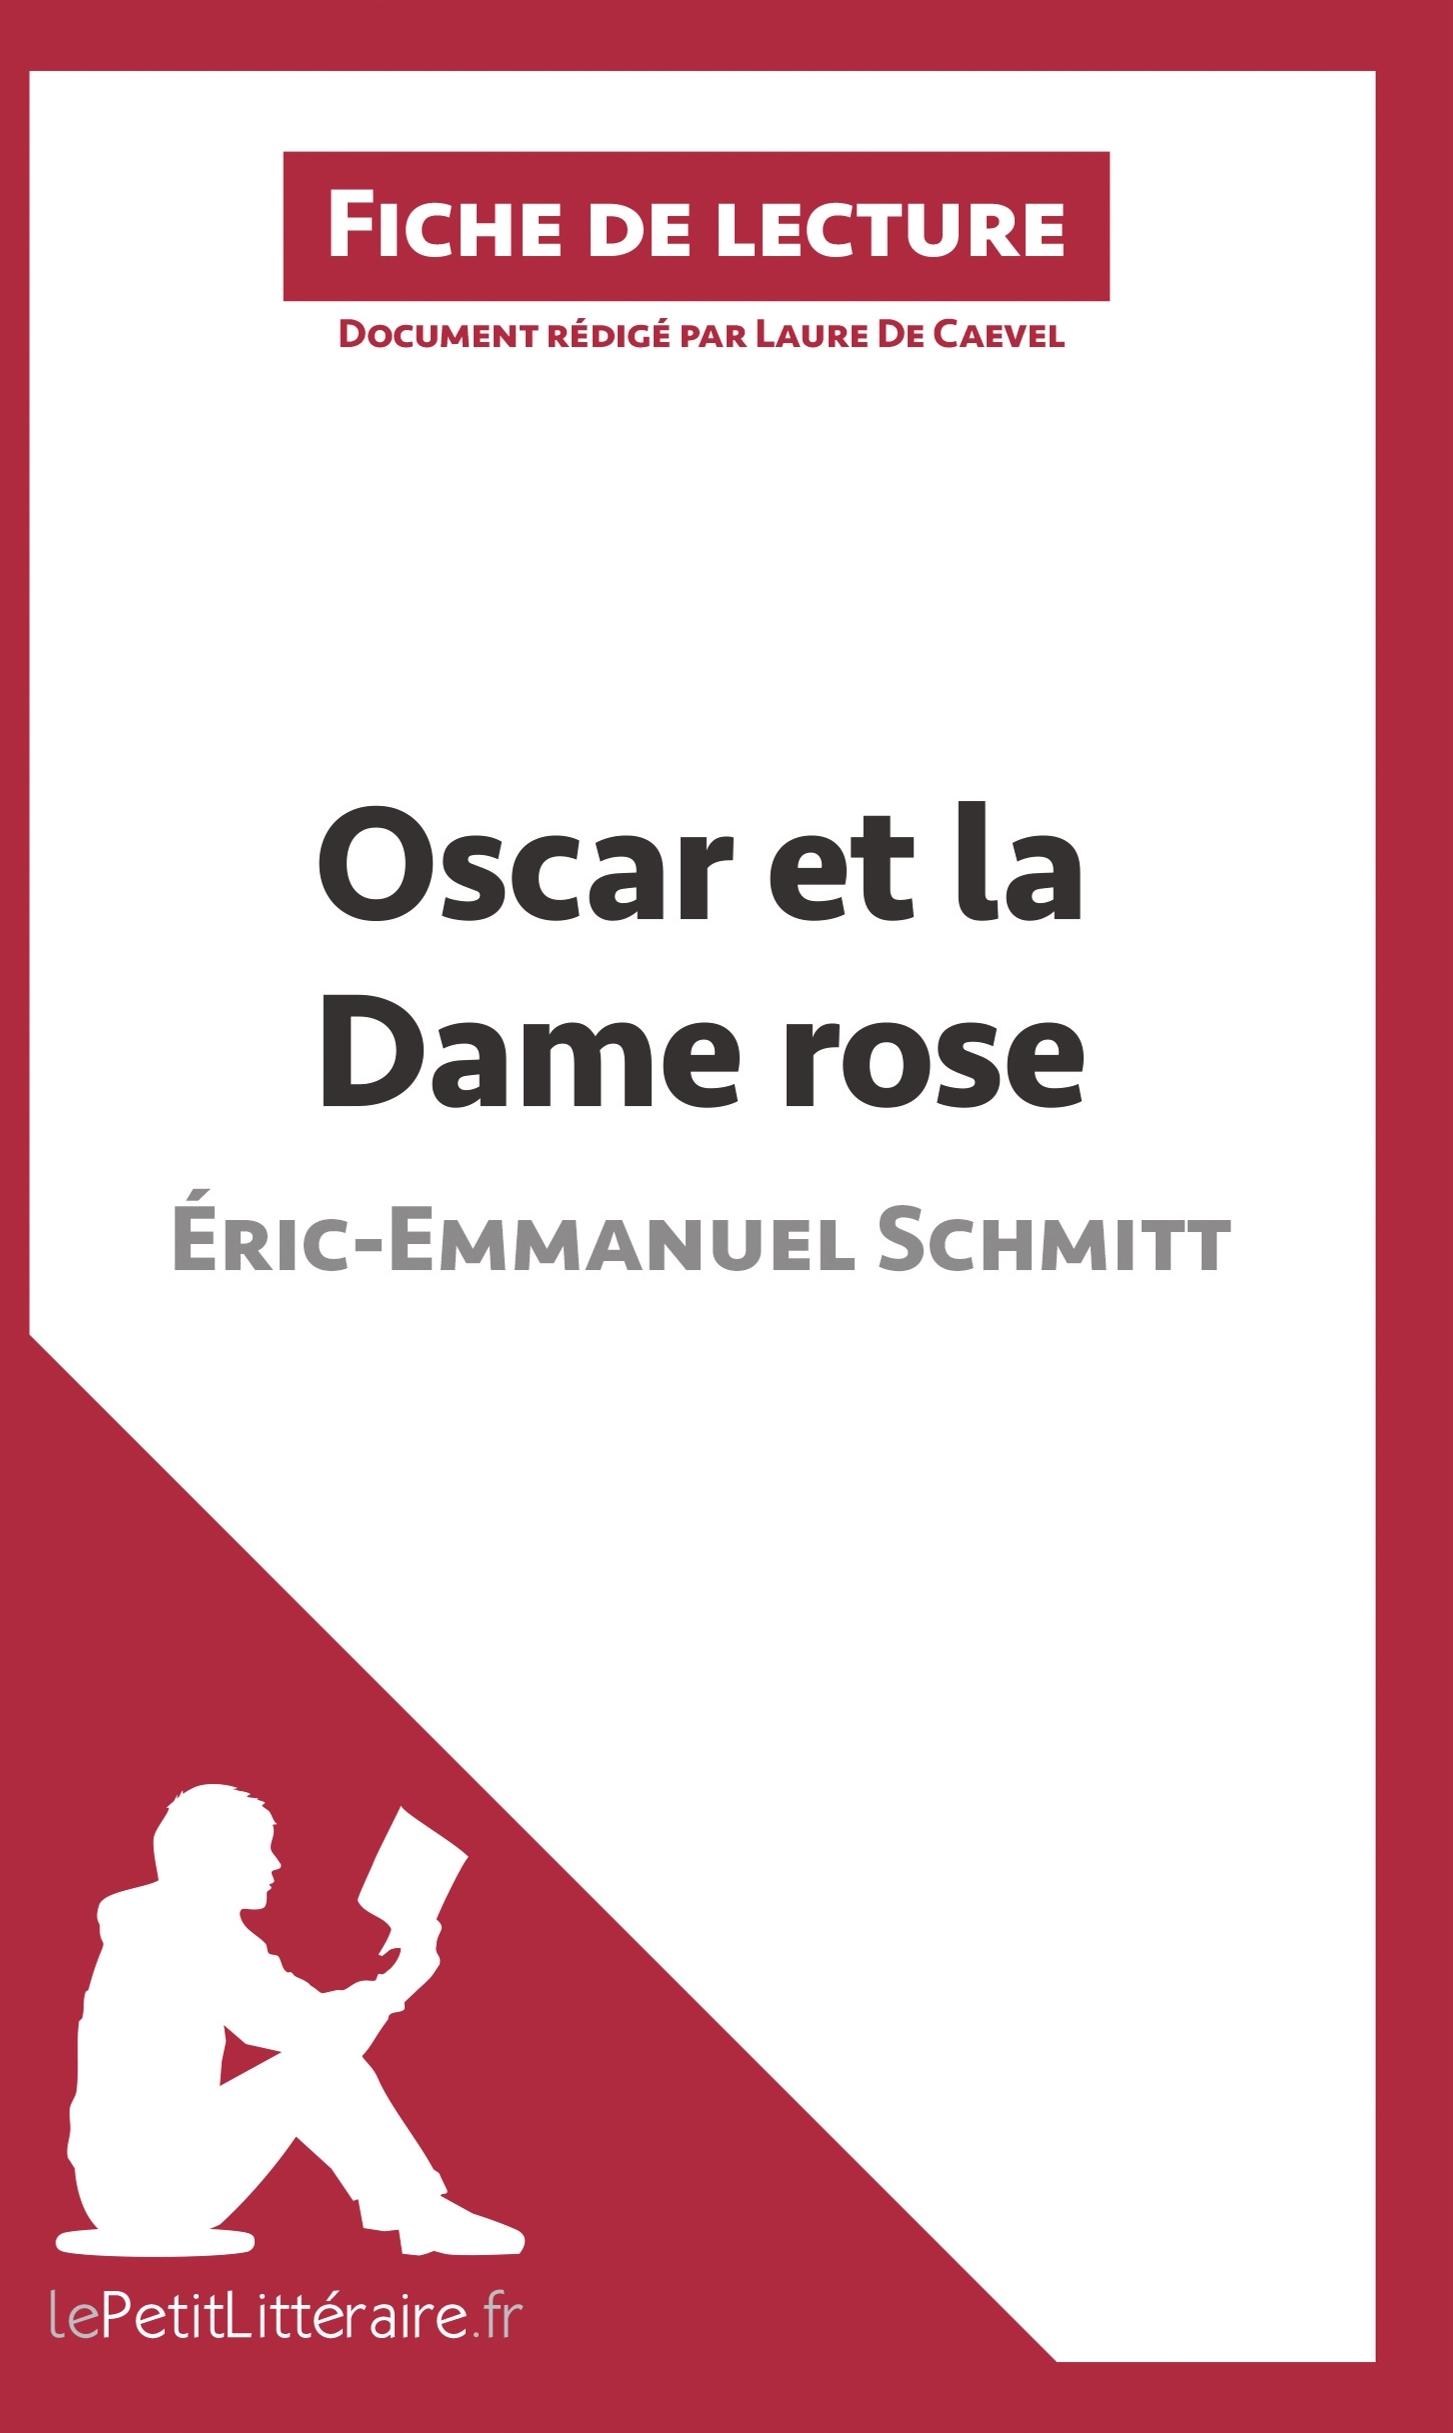 ANALYSE OSCAR ET LA DAME ROSE D ERIC EMMANUEL SCHMITT ANALYSE COMPLETE DE L UVR